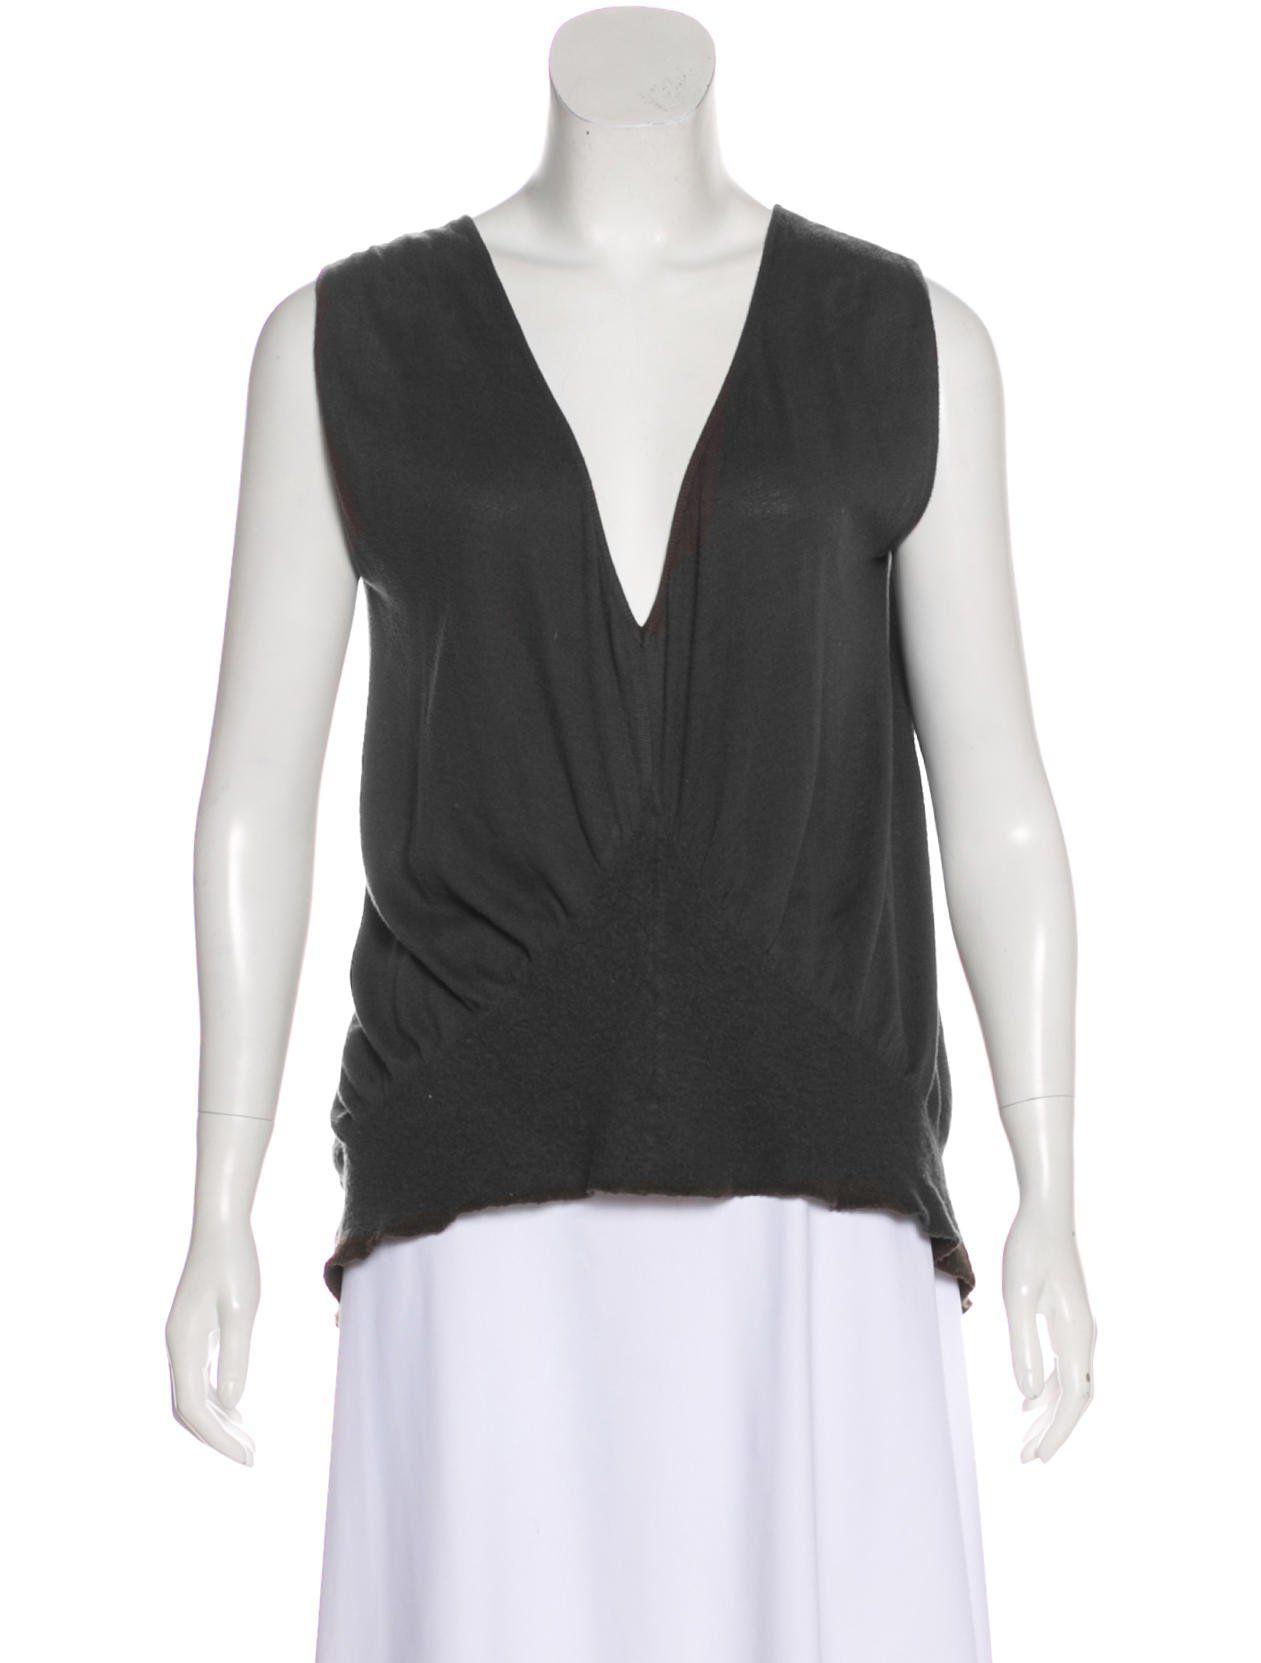 44b90fbf00d65c Charcoal Rick Owens sleeveless top featuring V-neck